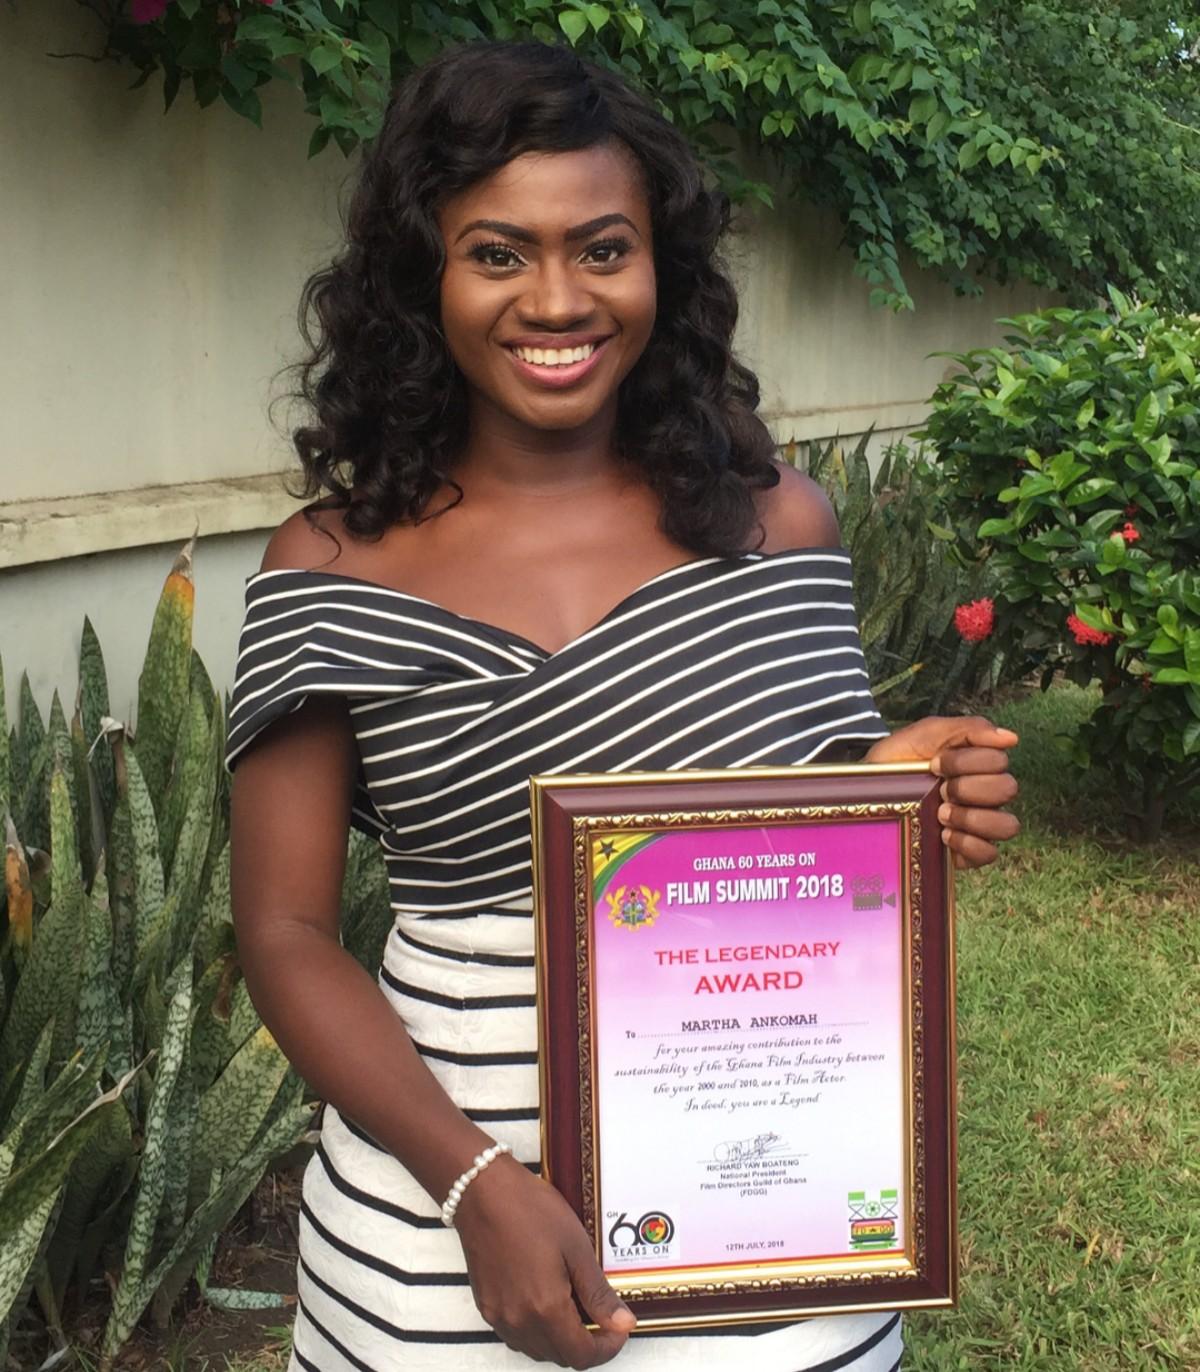 The Legendary Award Ghana 60 Years On Film Summit (2)